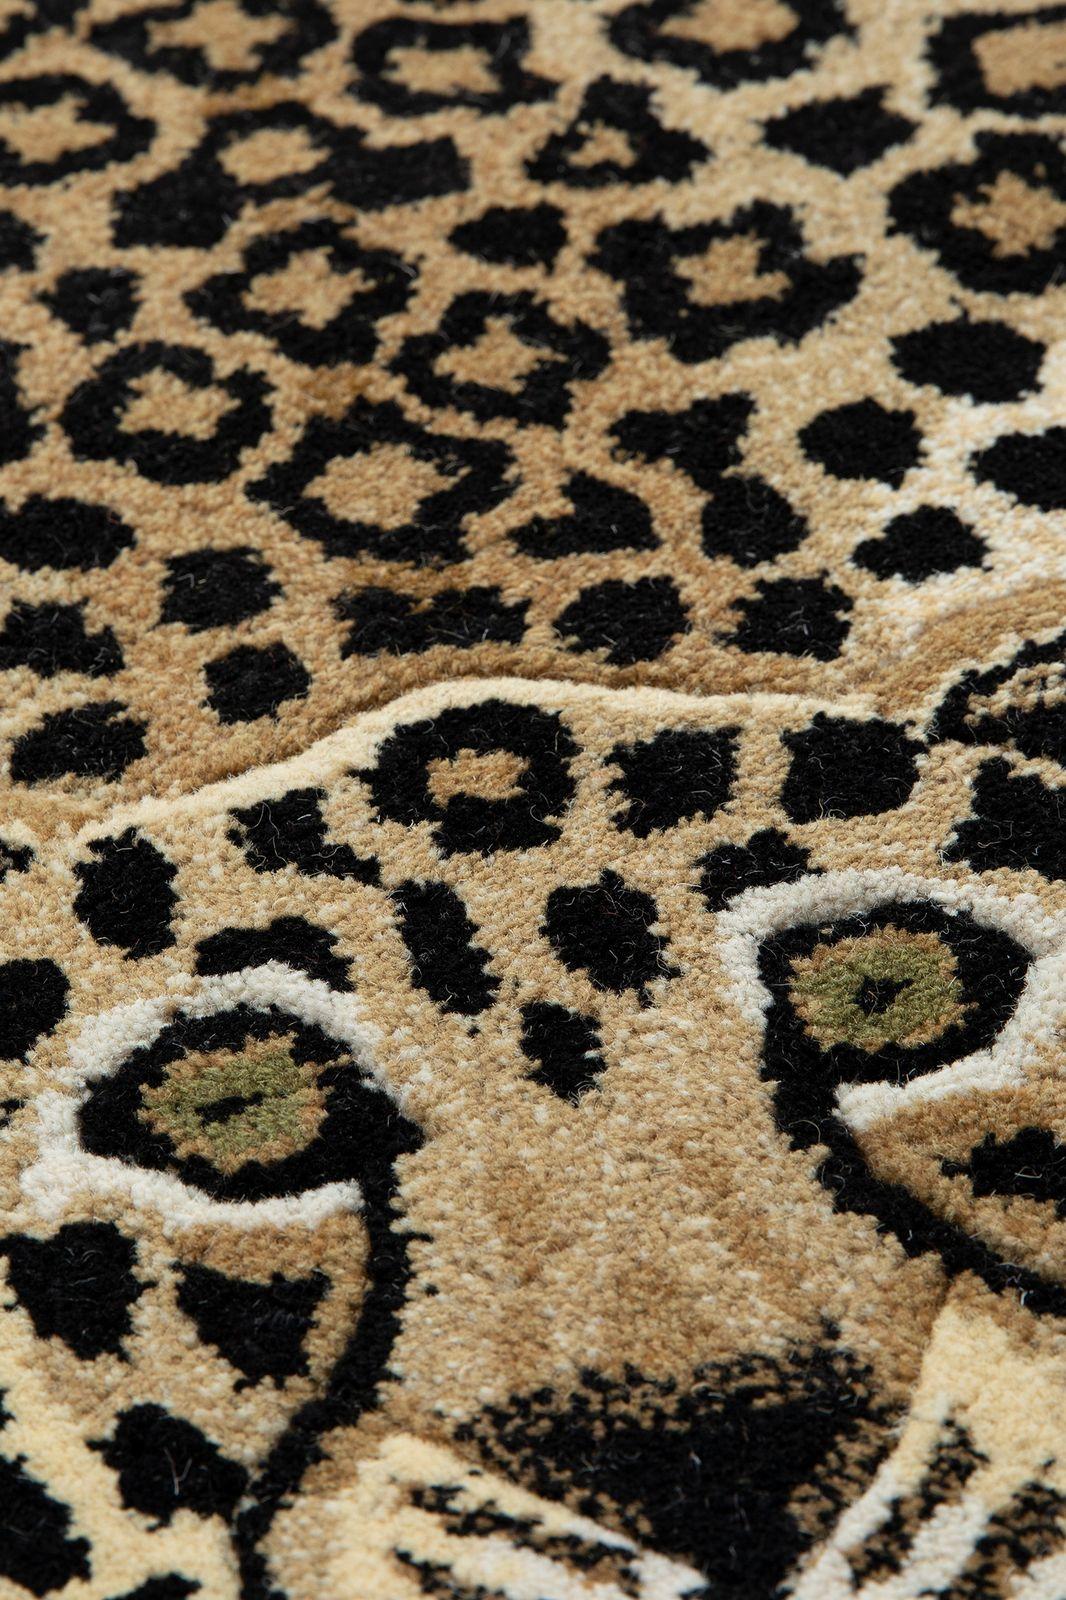 Doing goods loony leopard vloerkleed - Homeland   Sissy-Boy